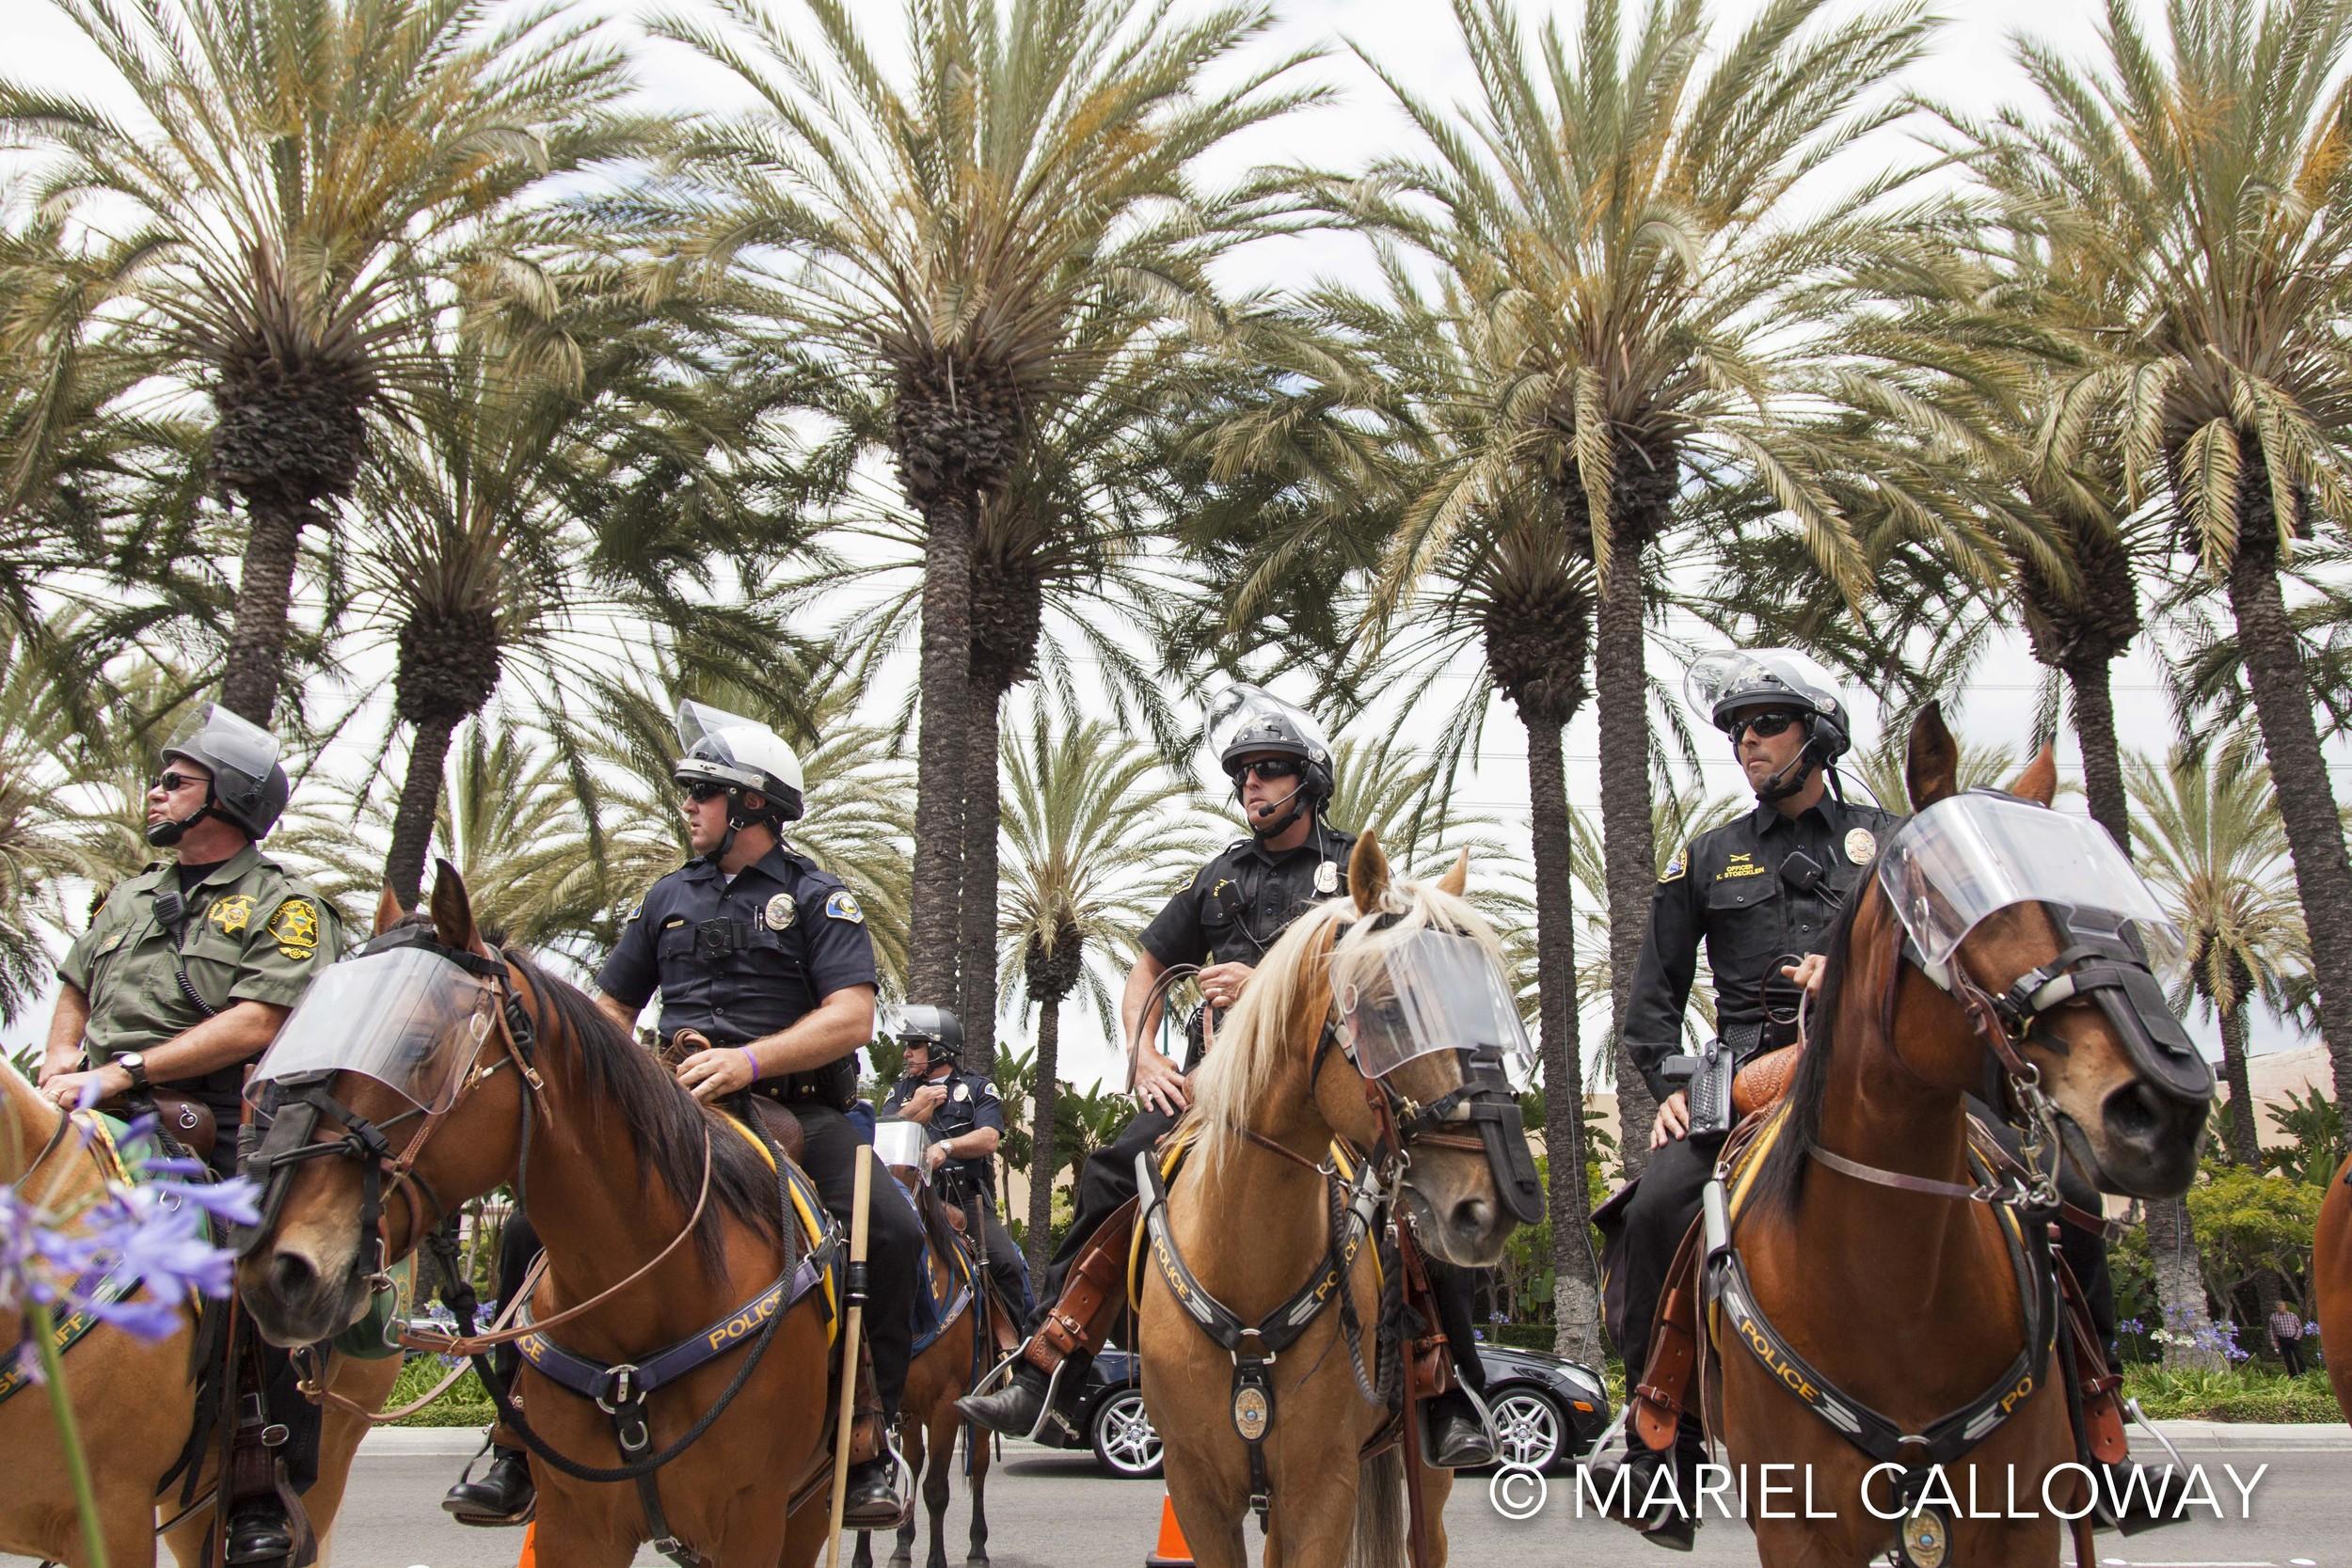 Mariel-Calloway-Donald-Trump-Anaheim-17.jpg